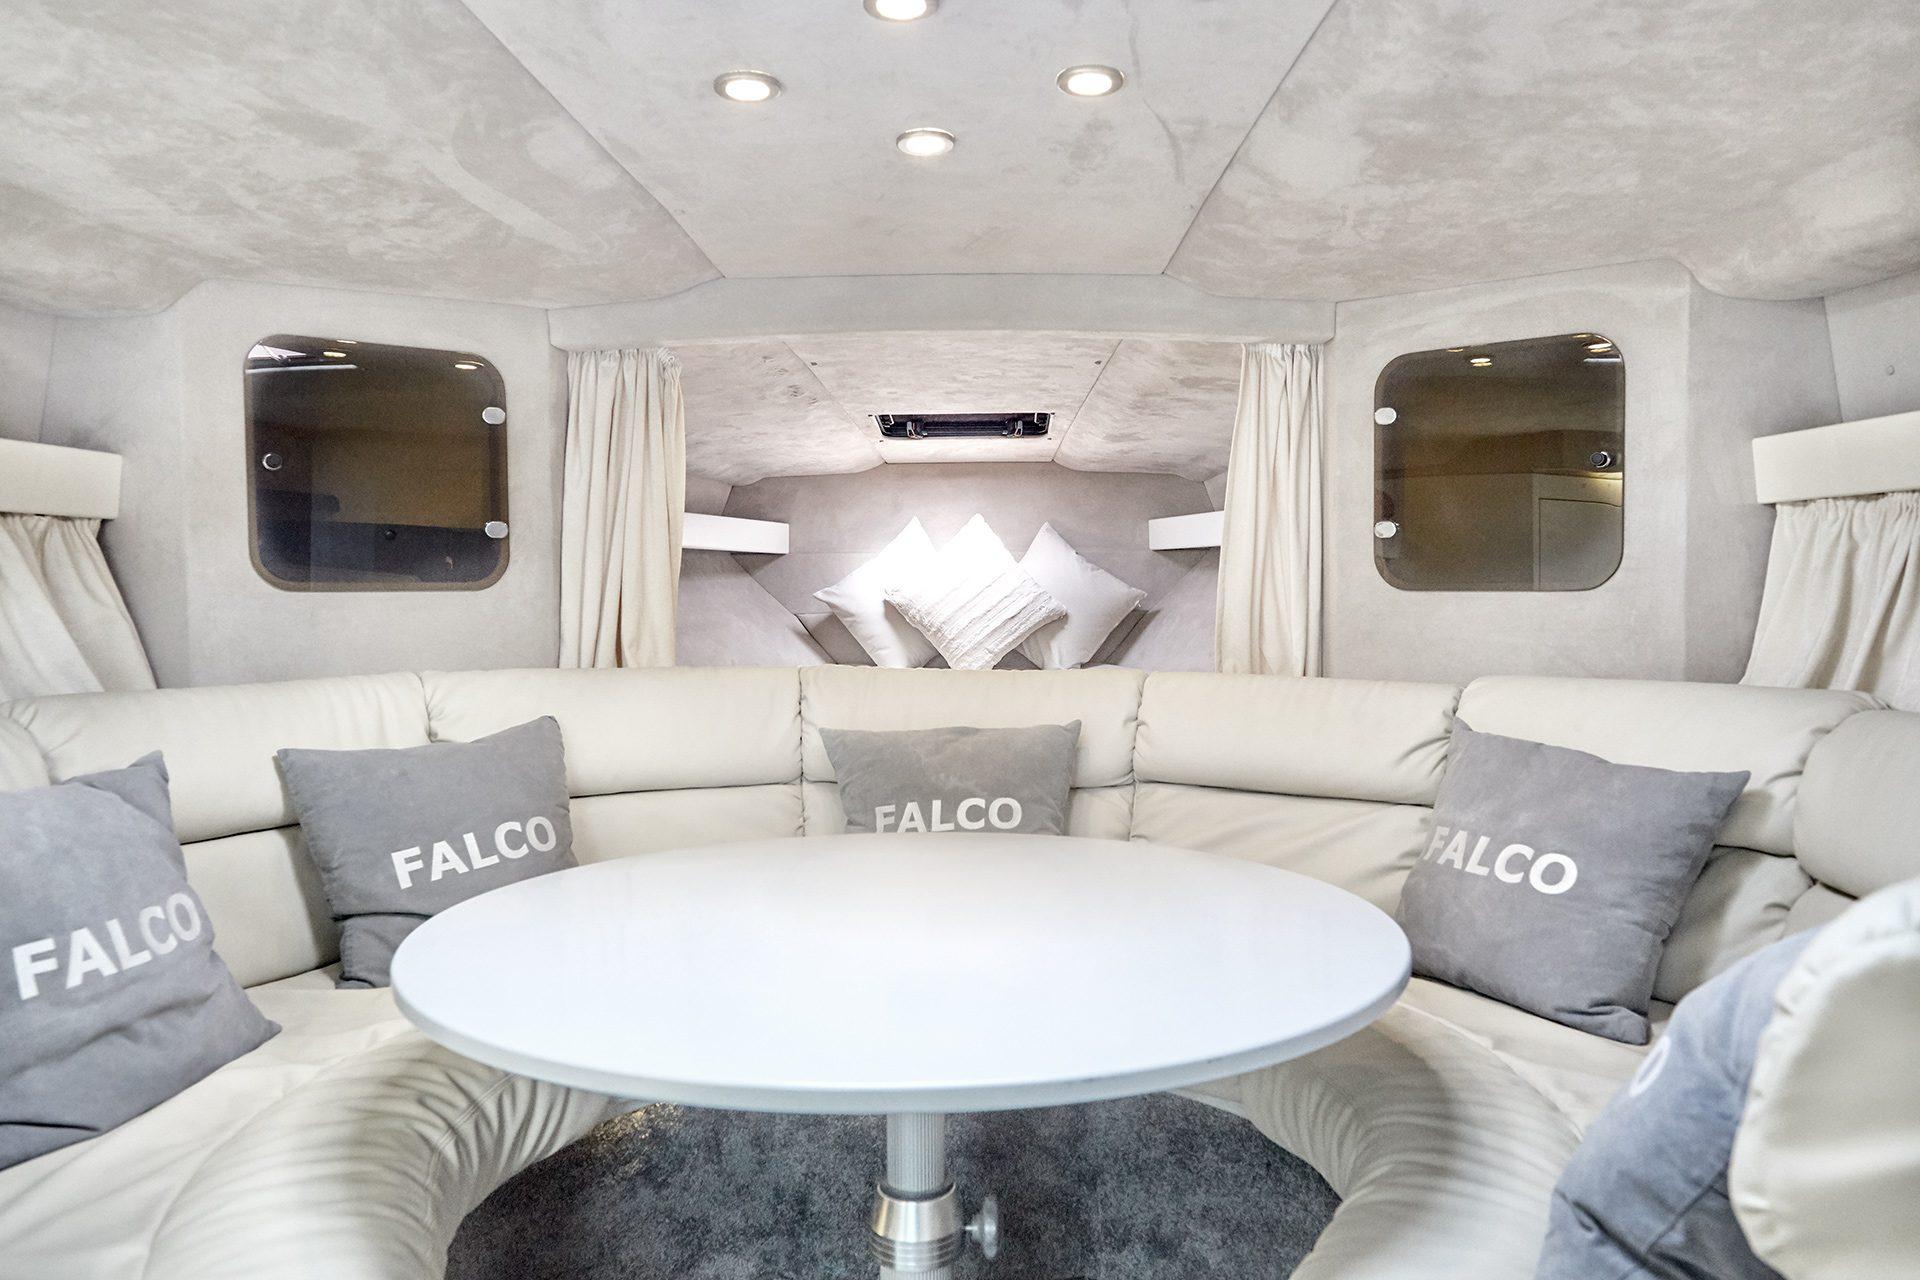 Sunseeker 43 Falco 11